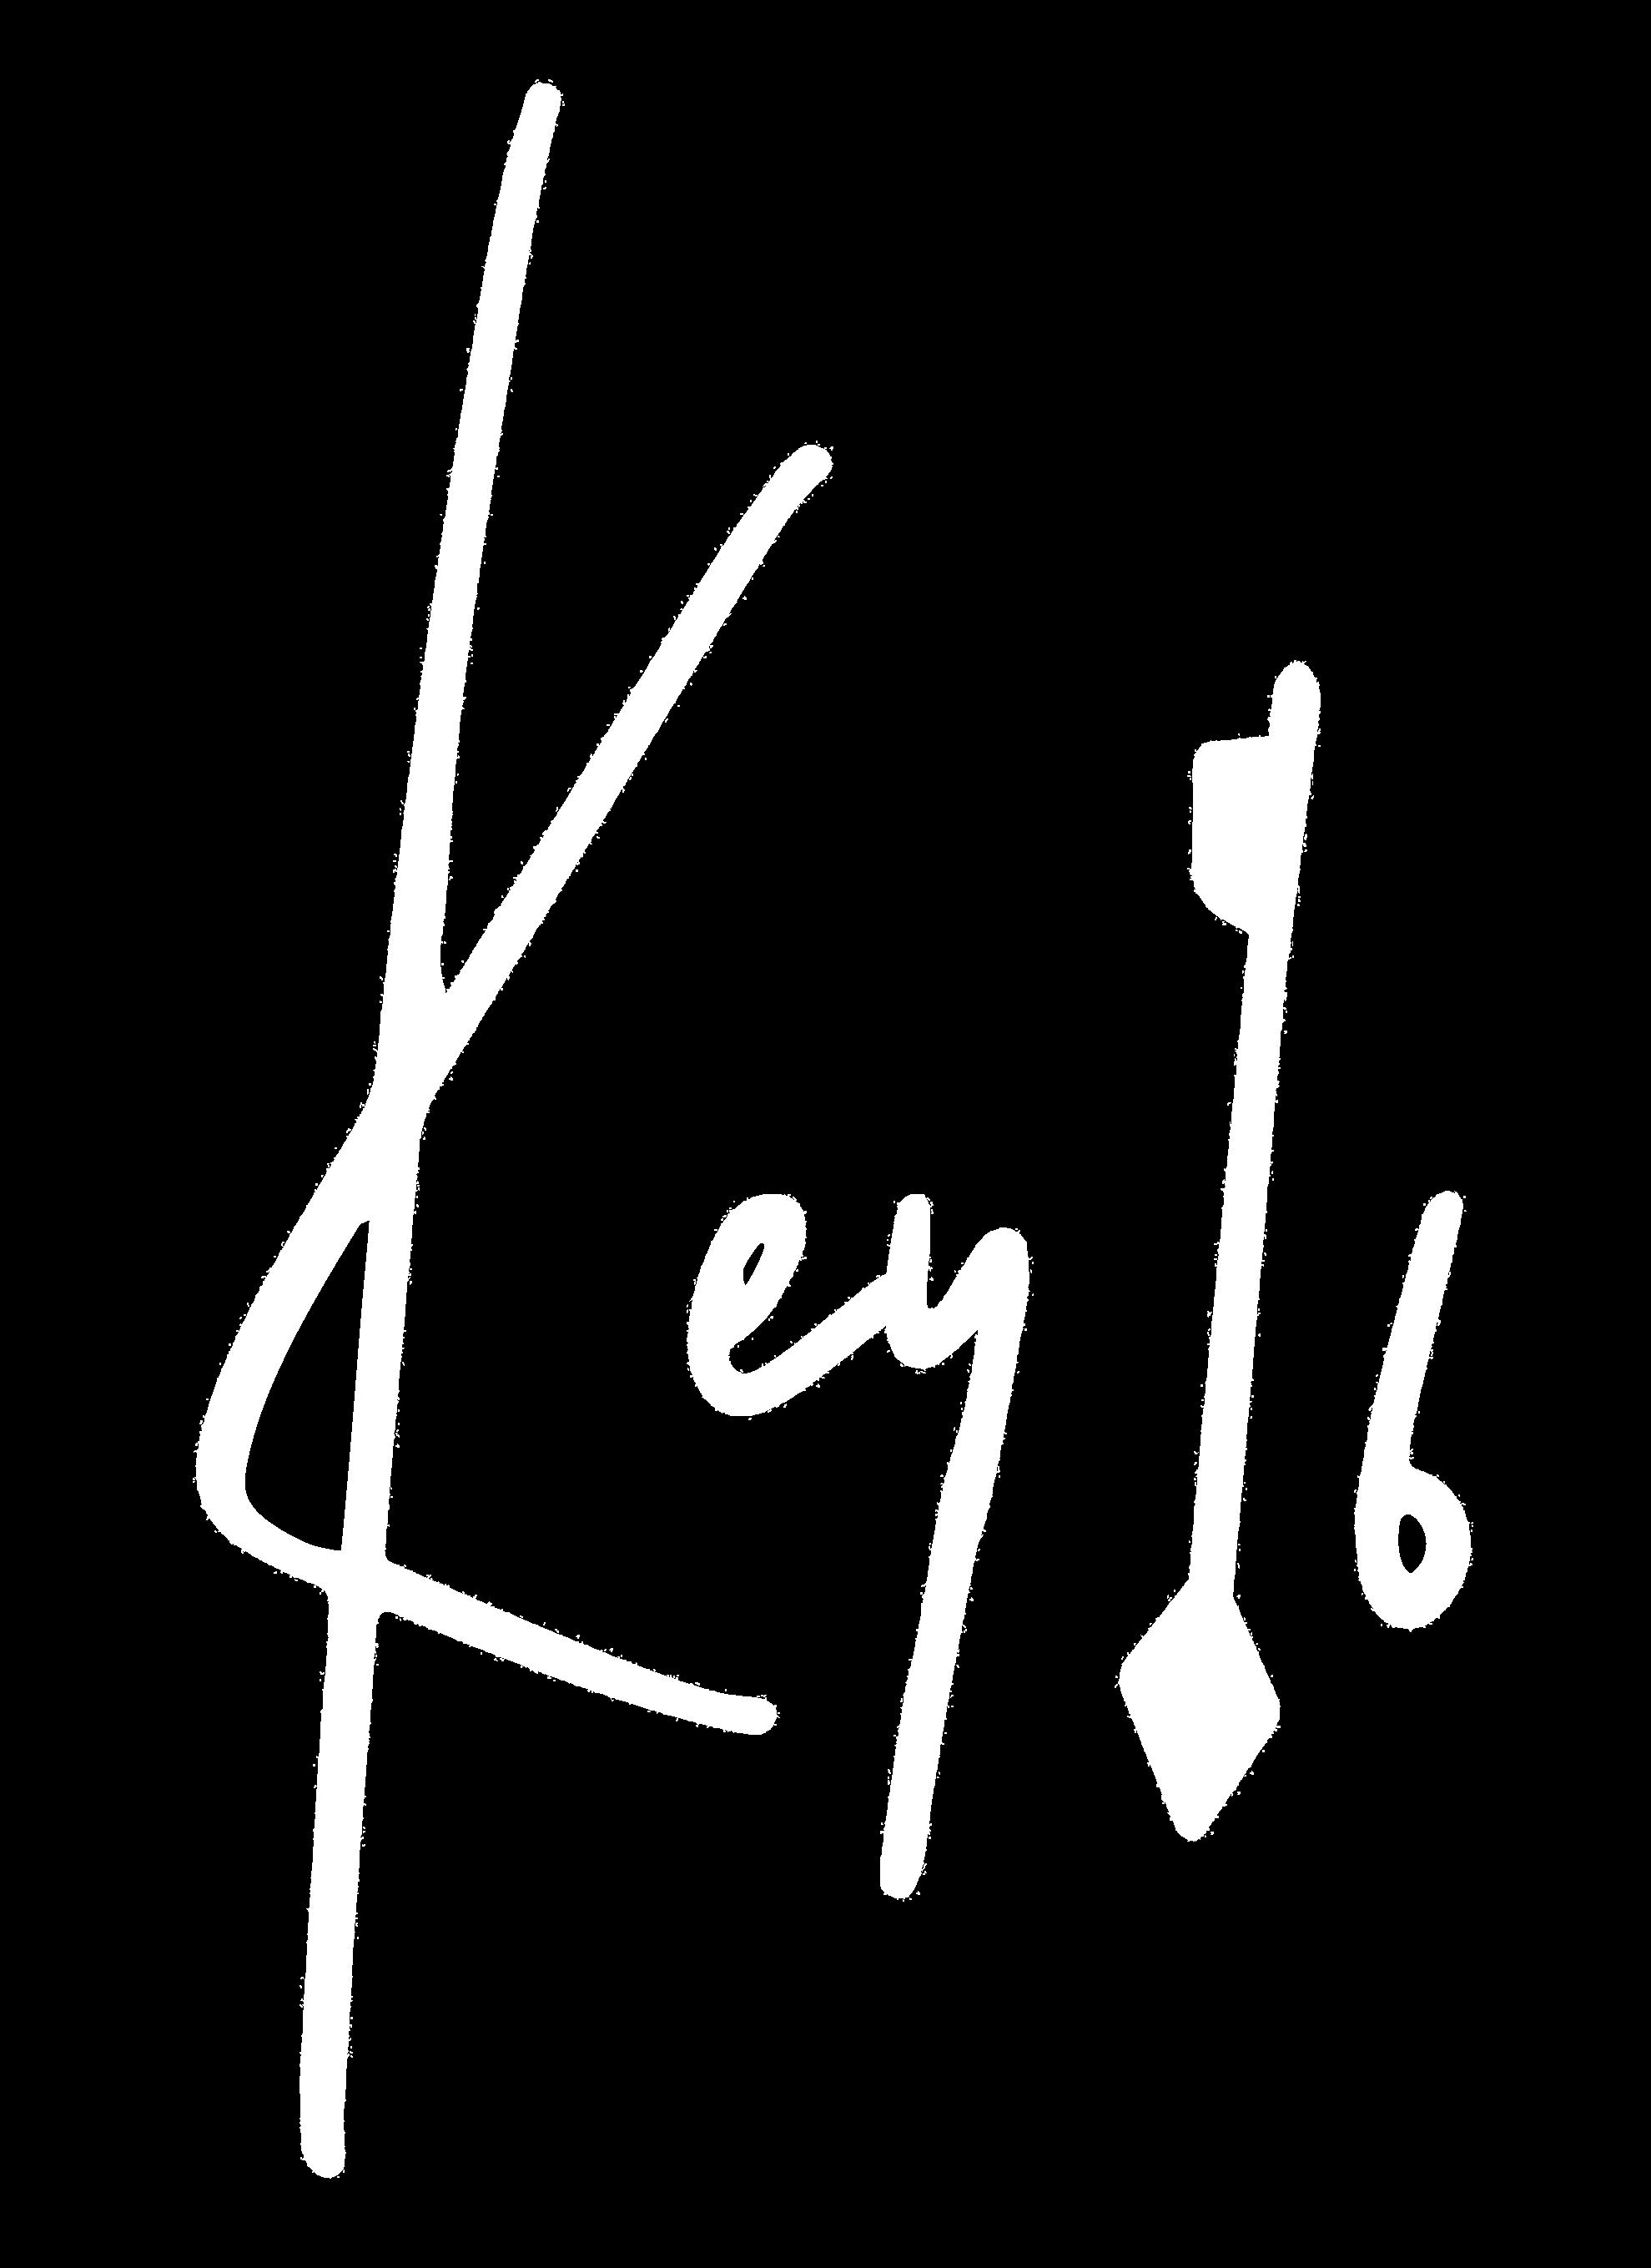 Key16 Logo